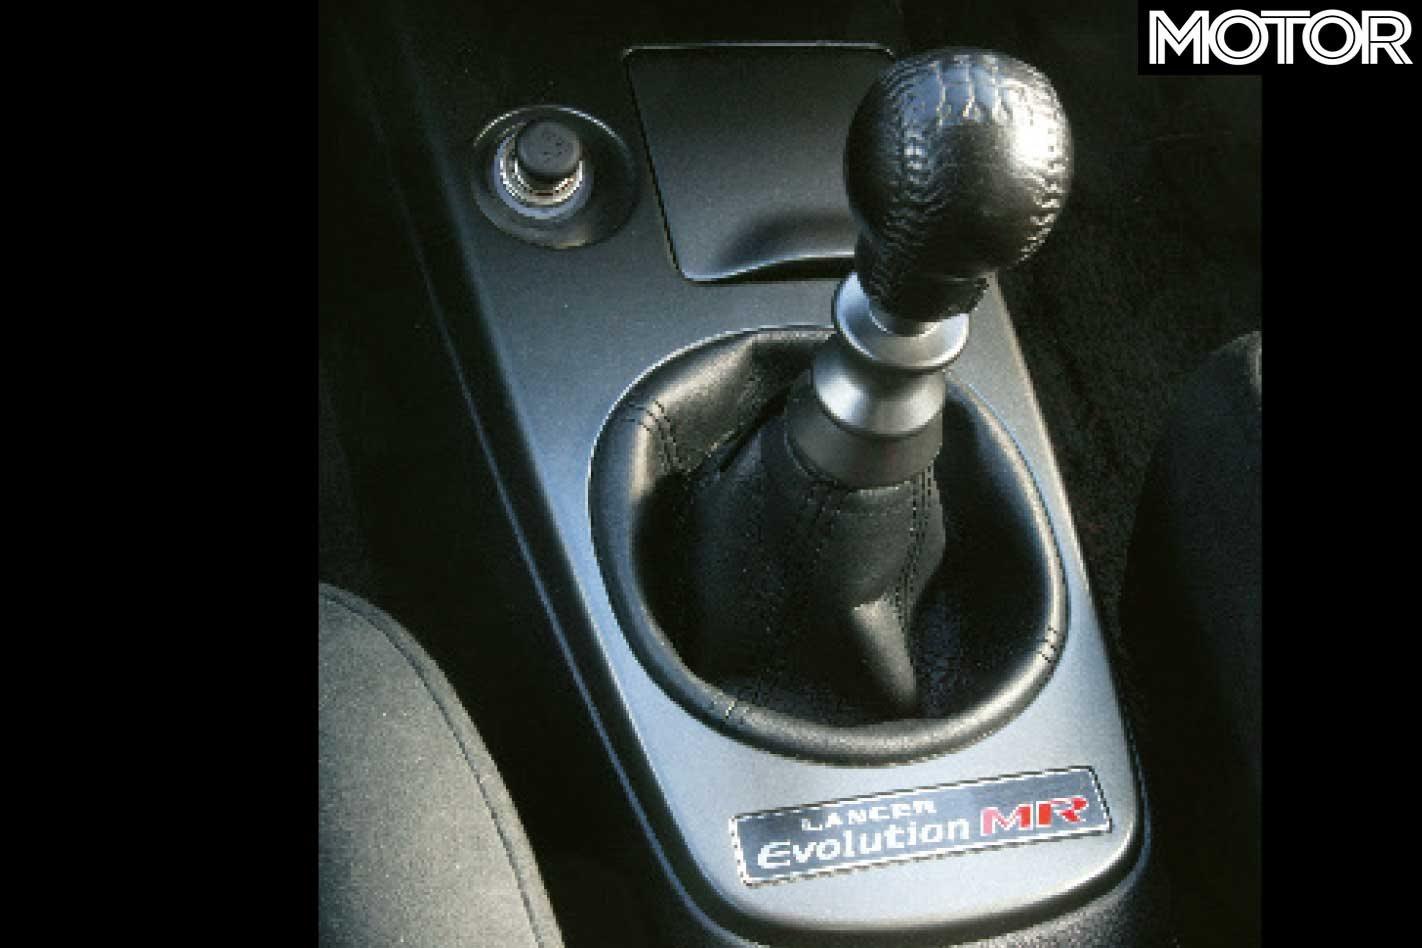 2004 Mitsubishi Lancer Evolution VIII MR review: classic MOTOR